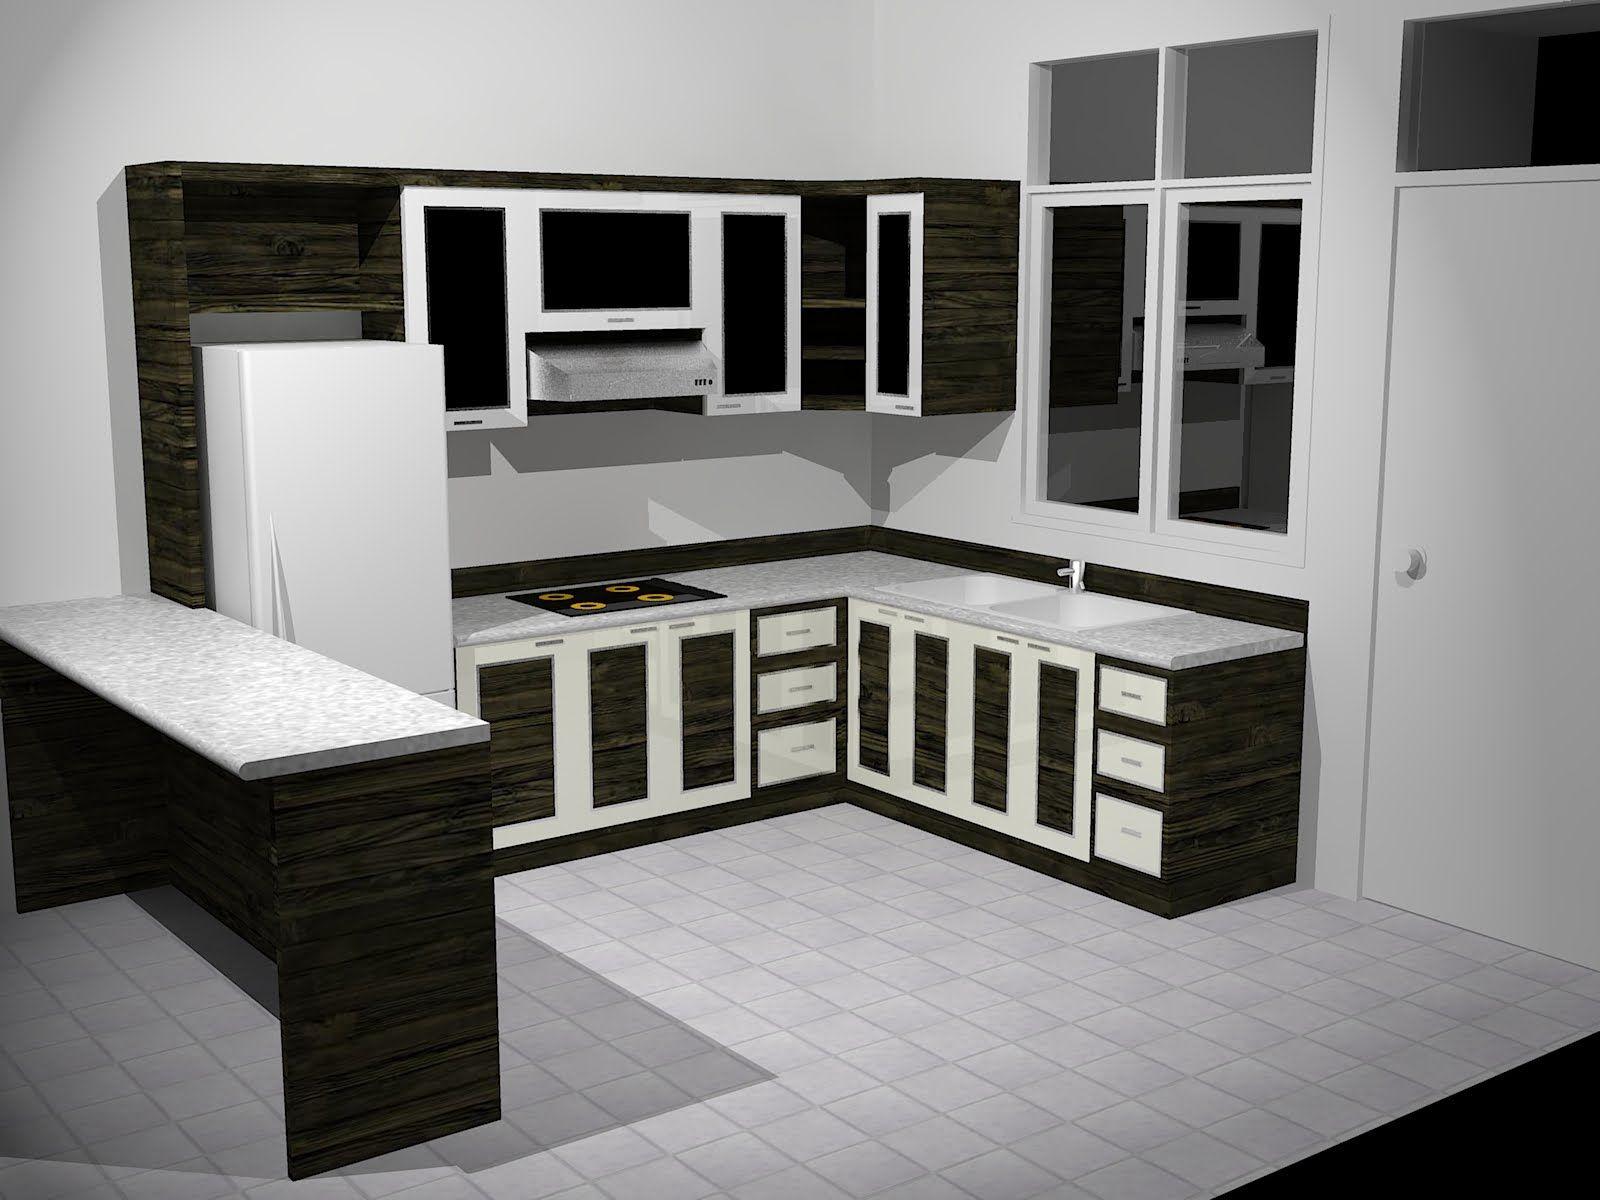 Black Kitchen Cabinets With White Doors Blackandwhitehighglossbedroomfurniturefurnitureappealing